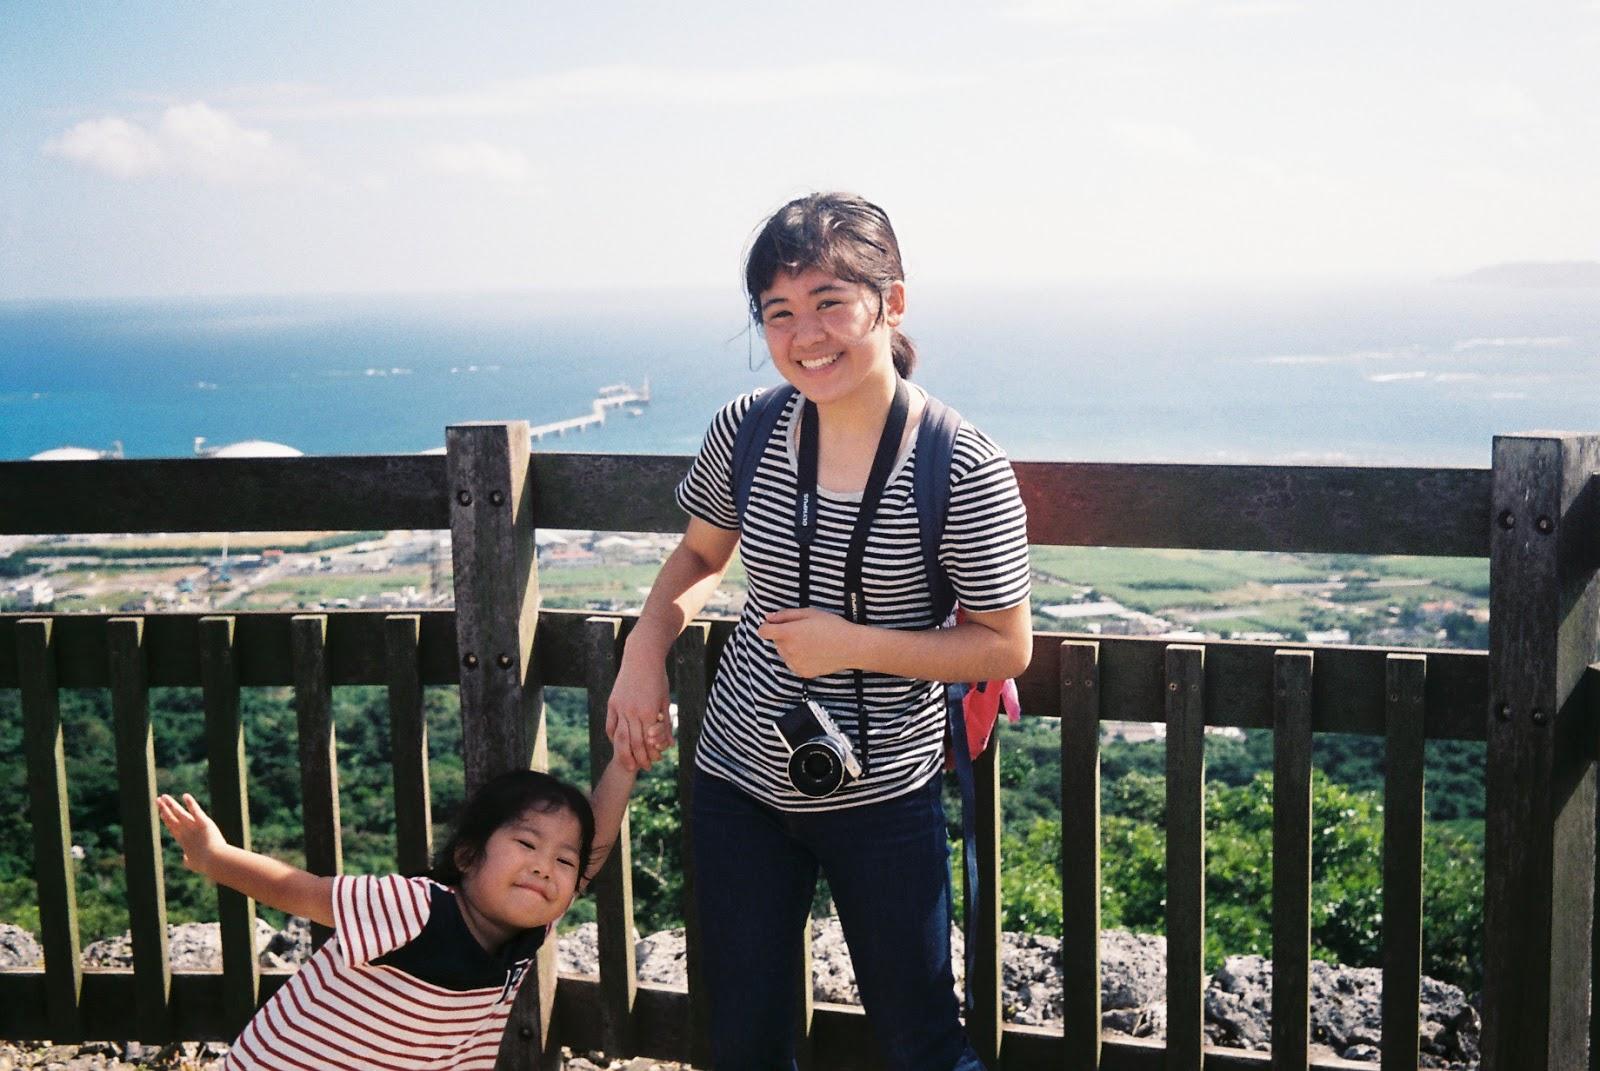 35mm, 35mm film, analog photography, photography, elashock, film, karen okuda, konichiwakaren, okinawa, japan, nakagusuku castle